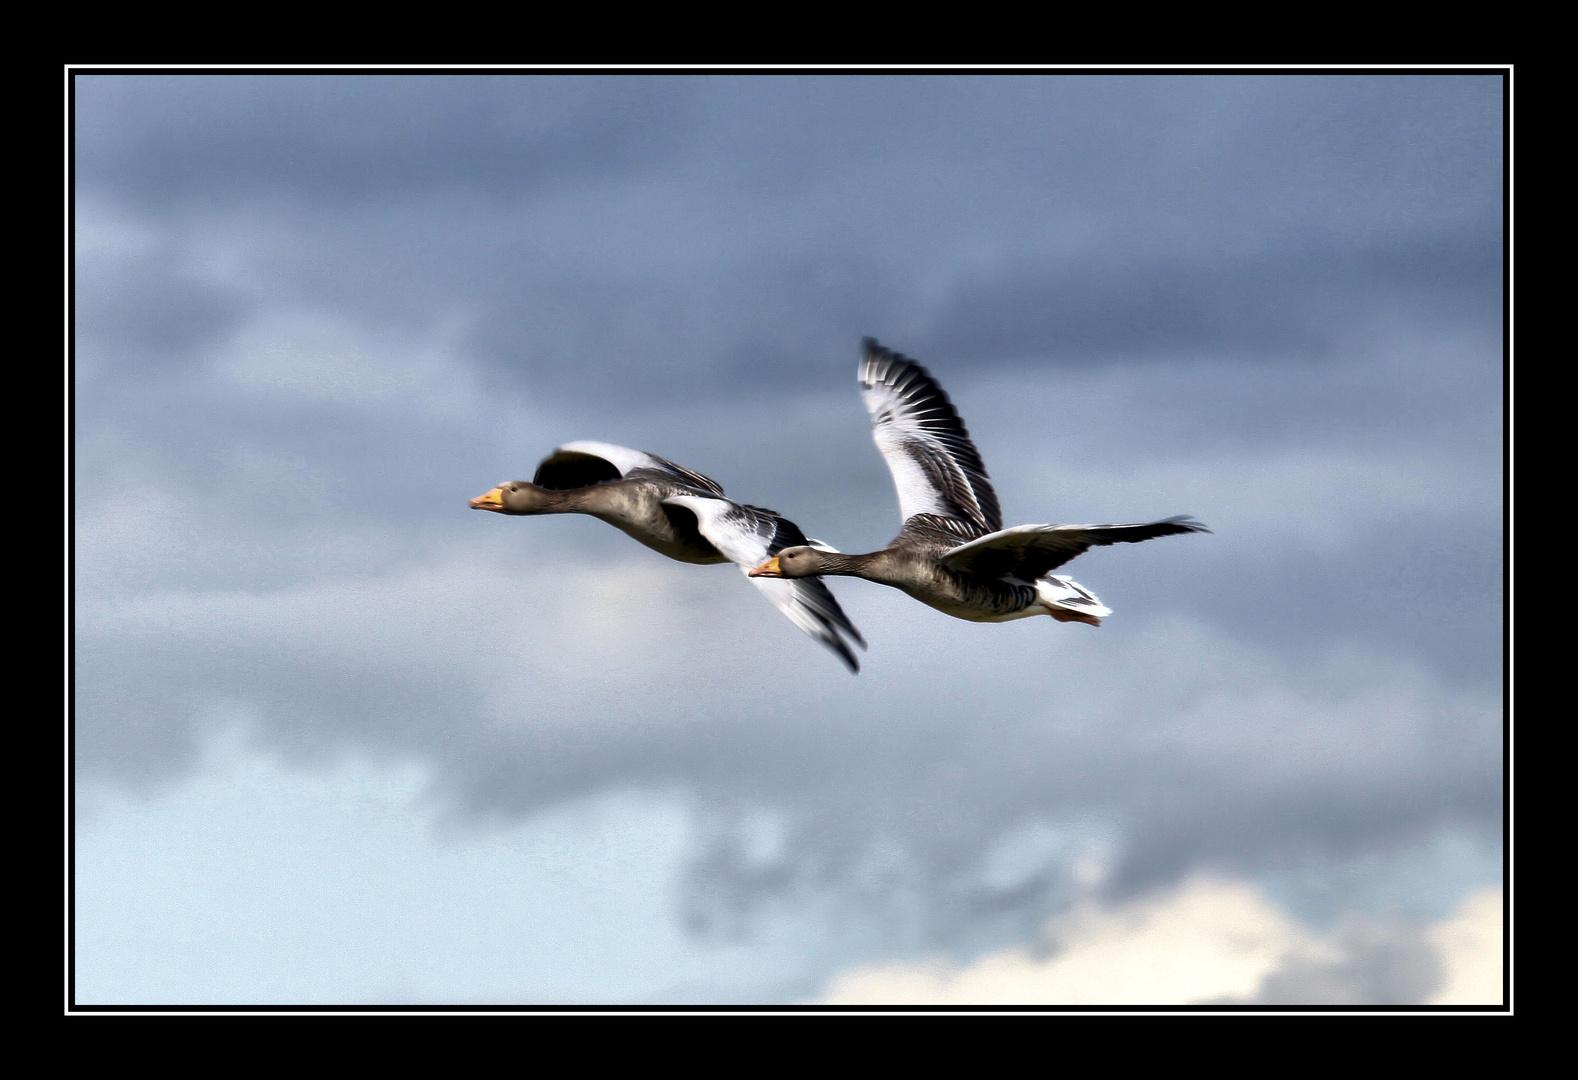 Flying..